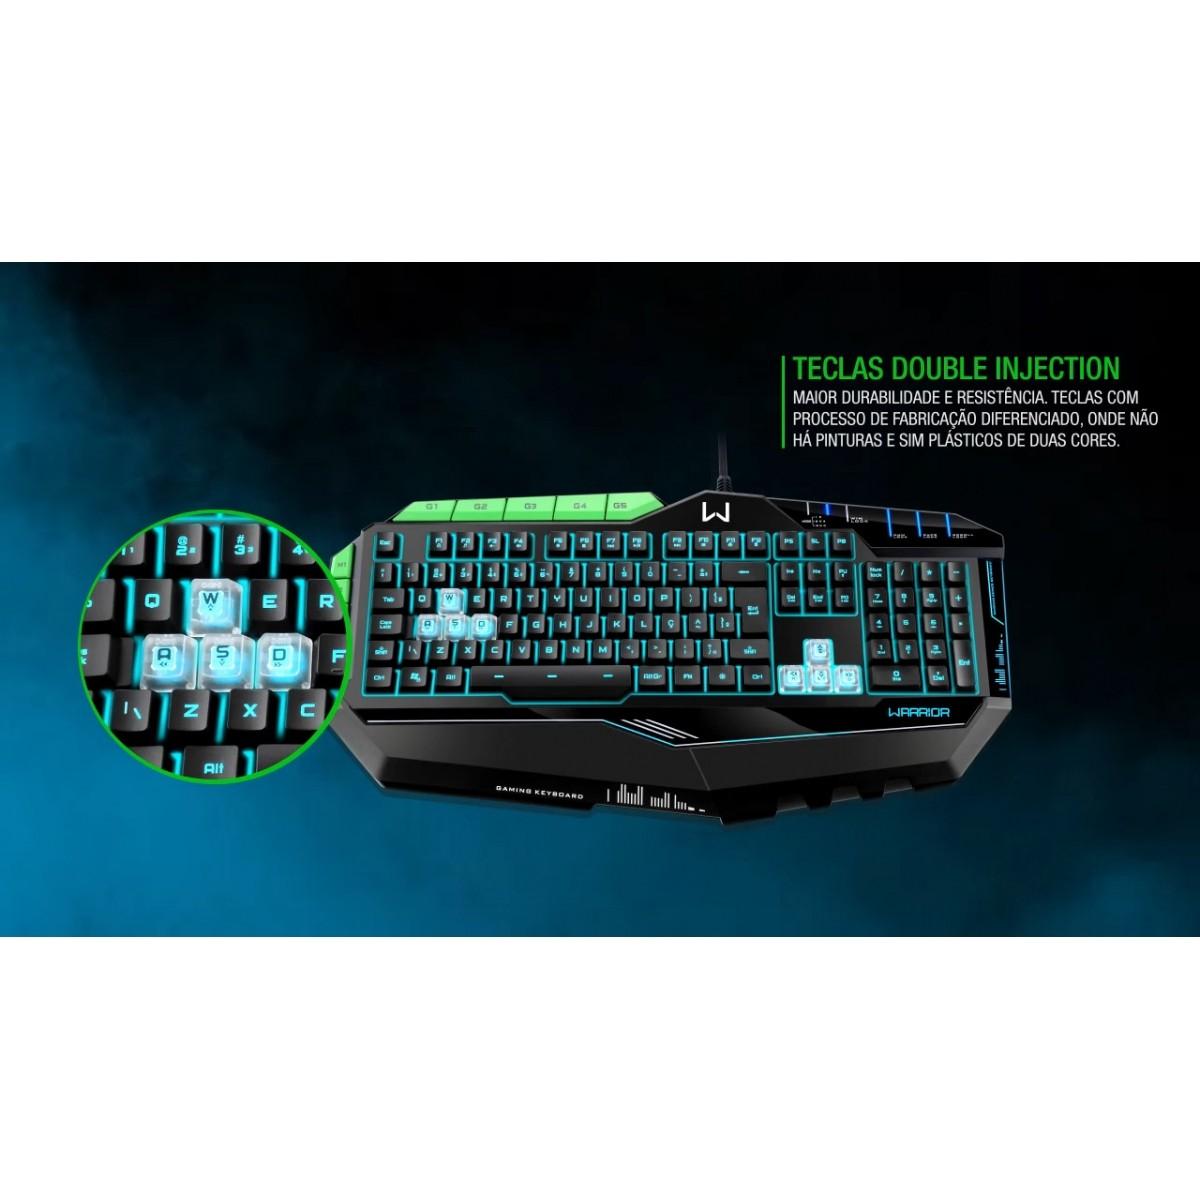 Teclado profissional gamer preto c/ verde led USB TC199 Multilaser  - Eletroinfocia